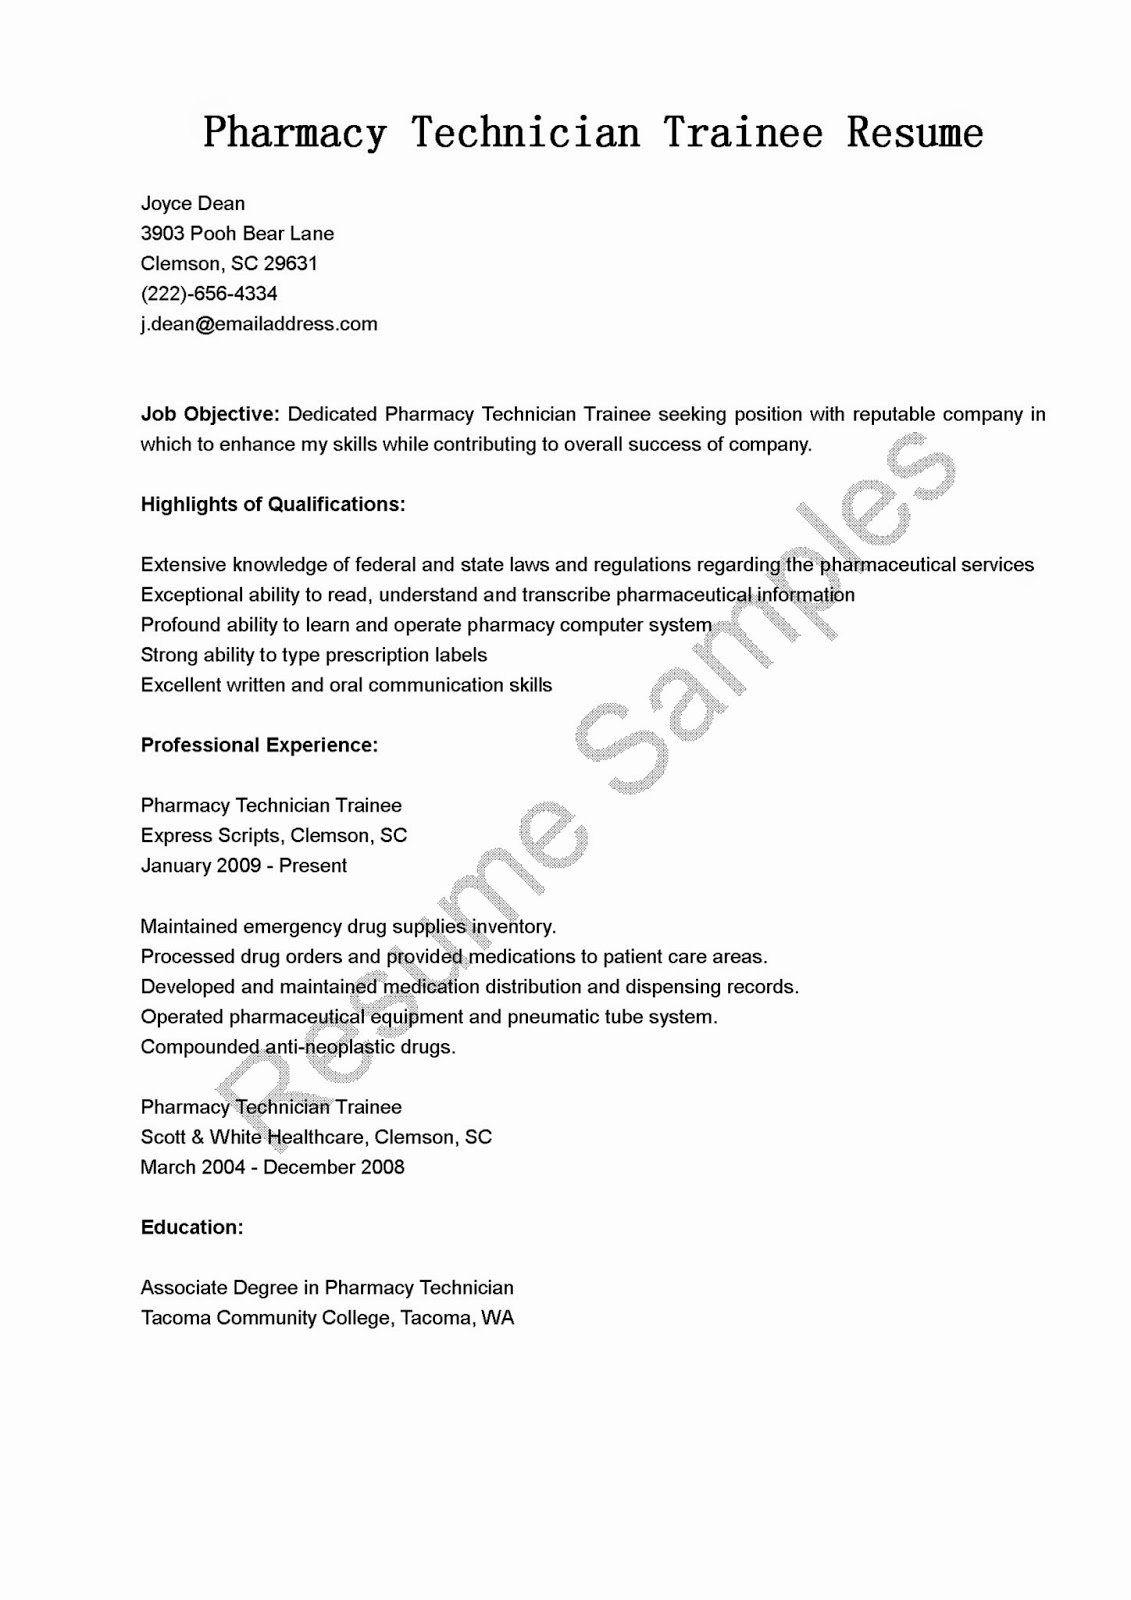 25 pharmacy technician resume objective in 2020 letter